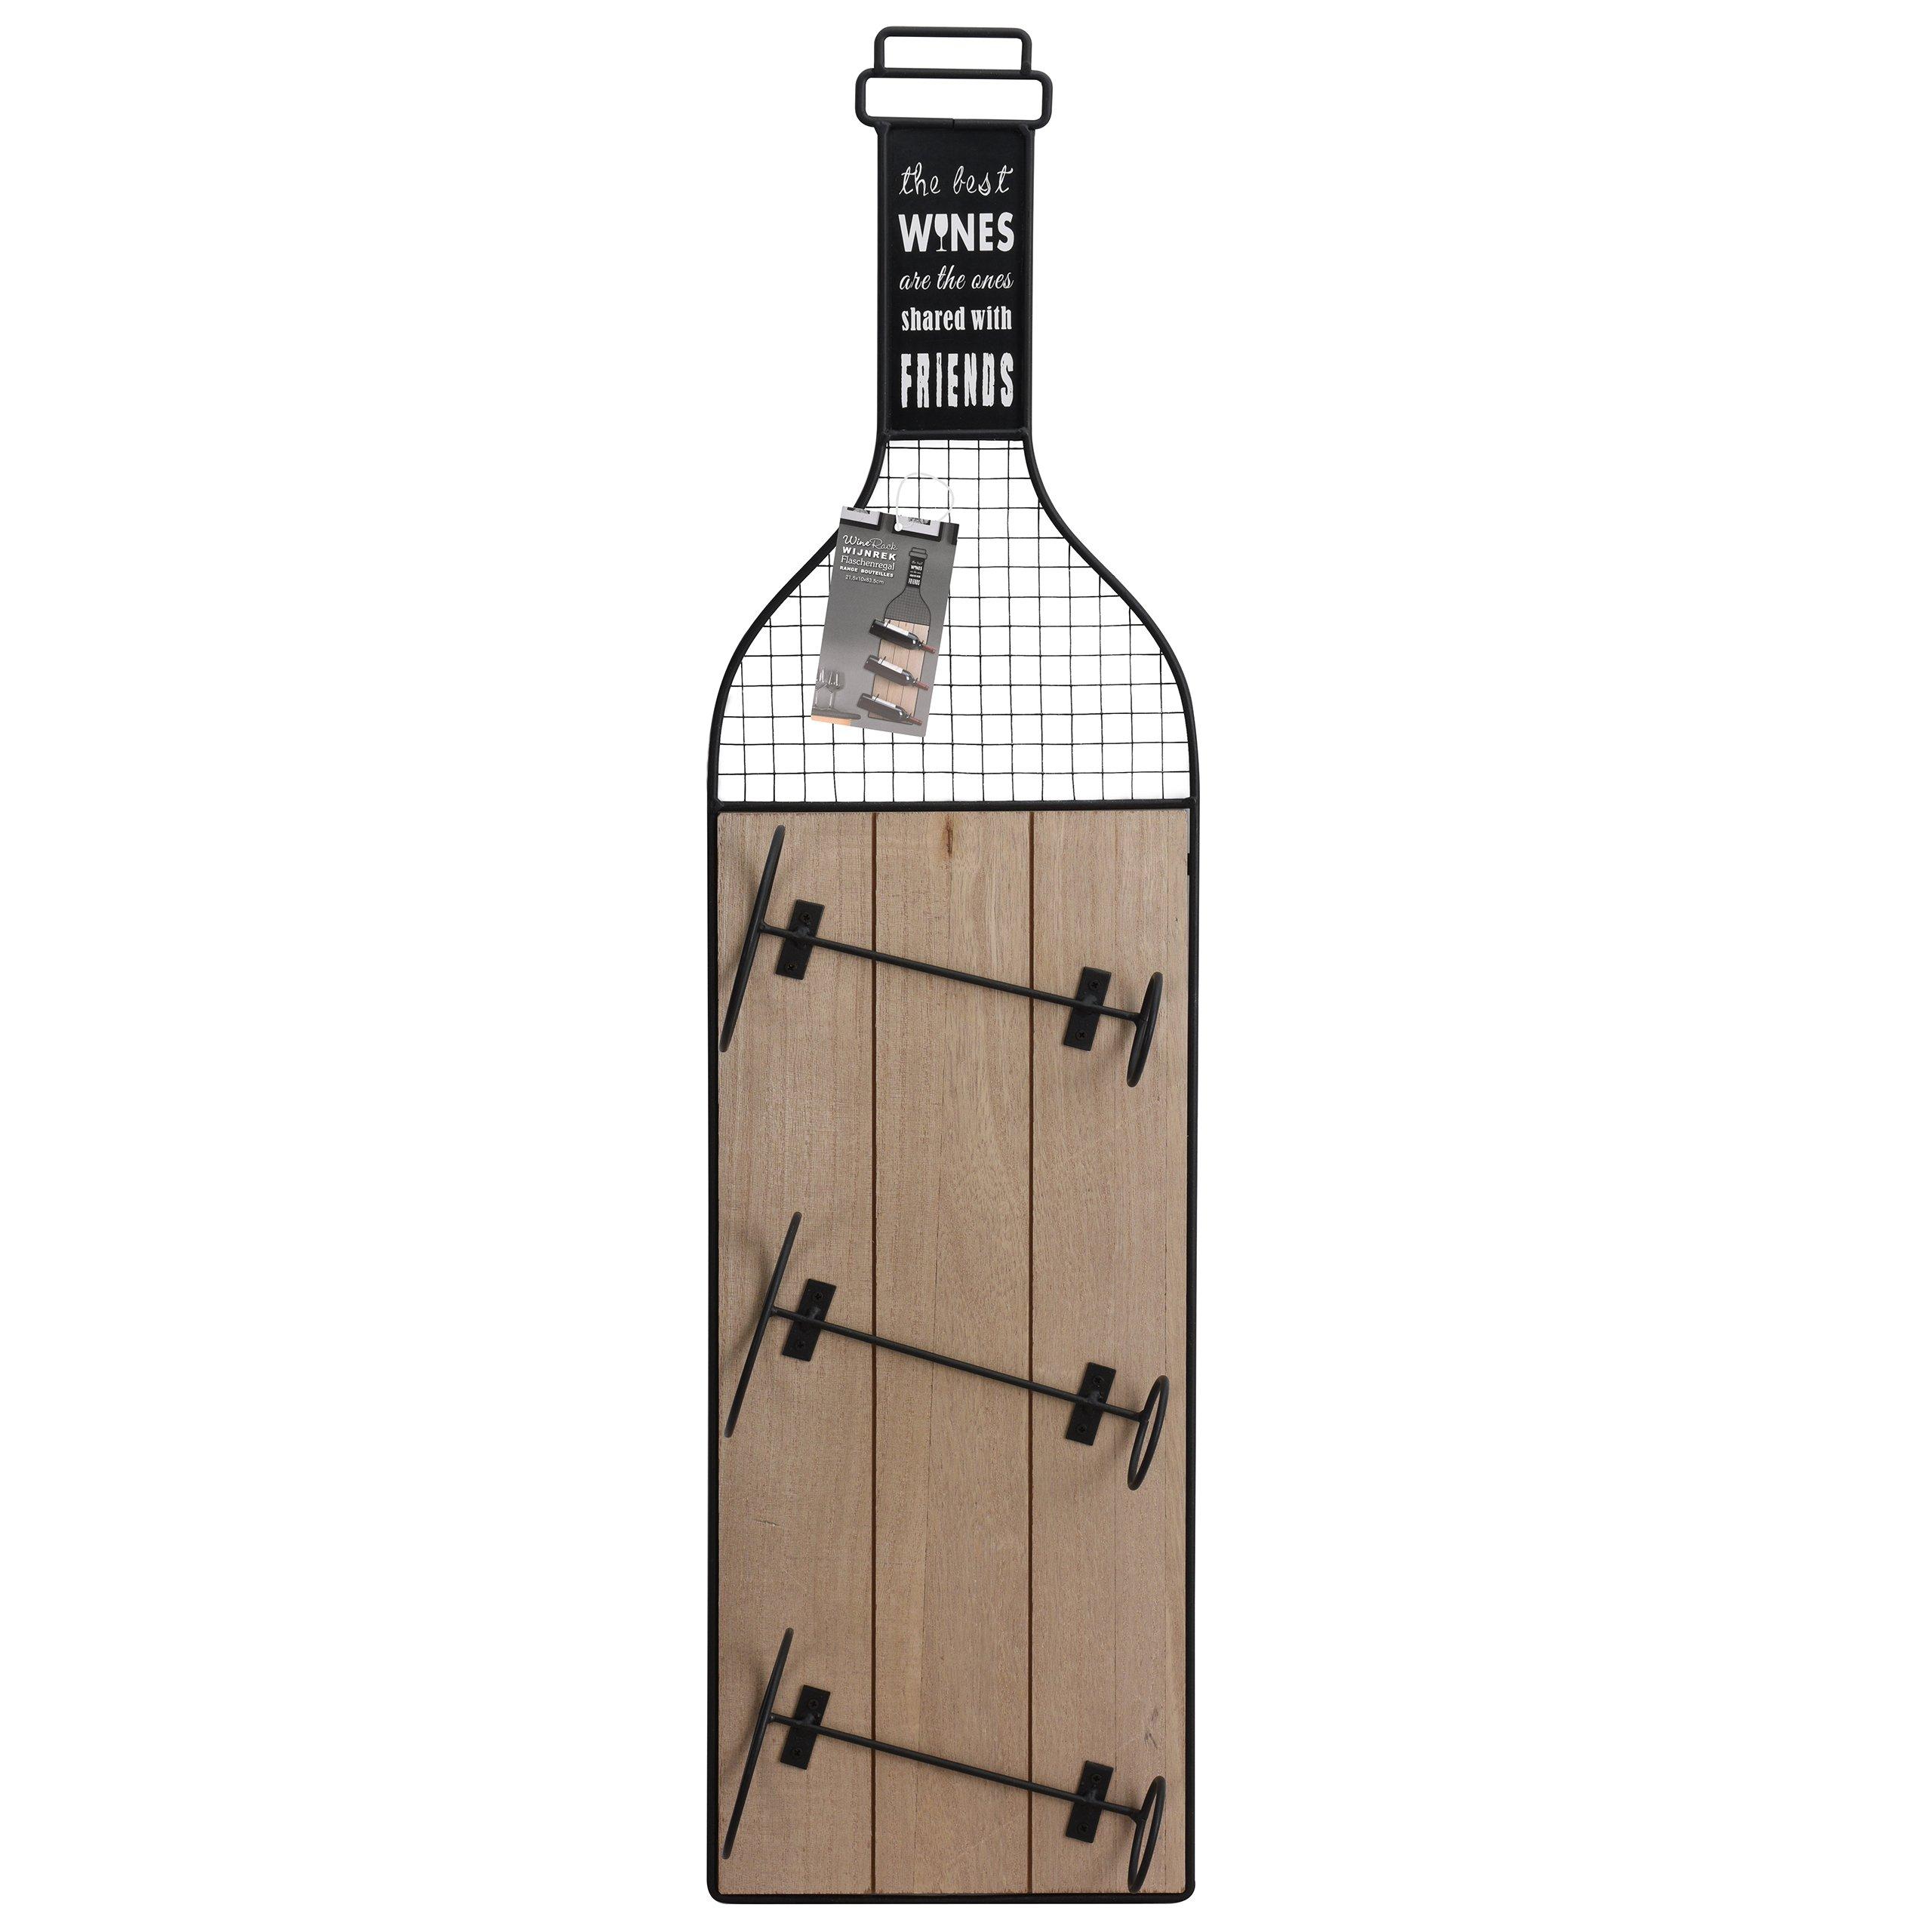 Uchwyt Na Wino Alkohol Wina Butelki Stojak 6551775703